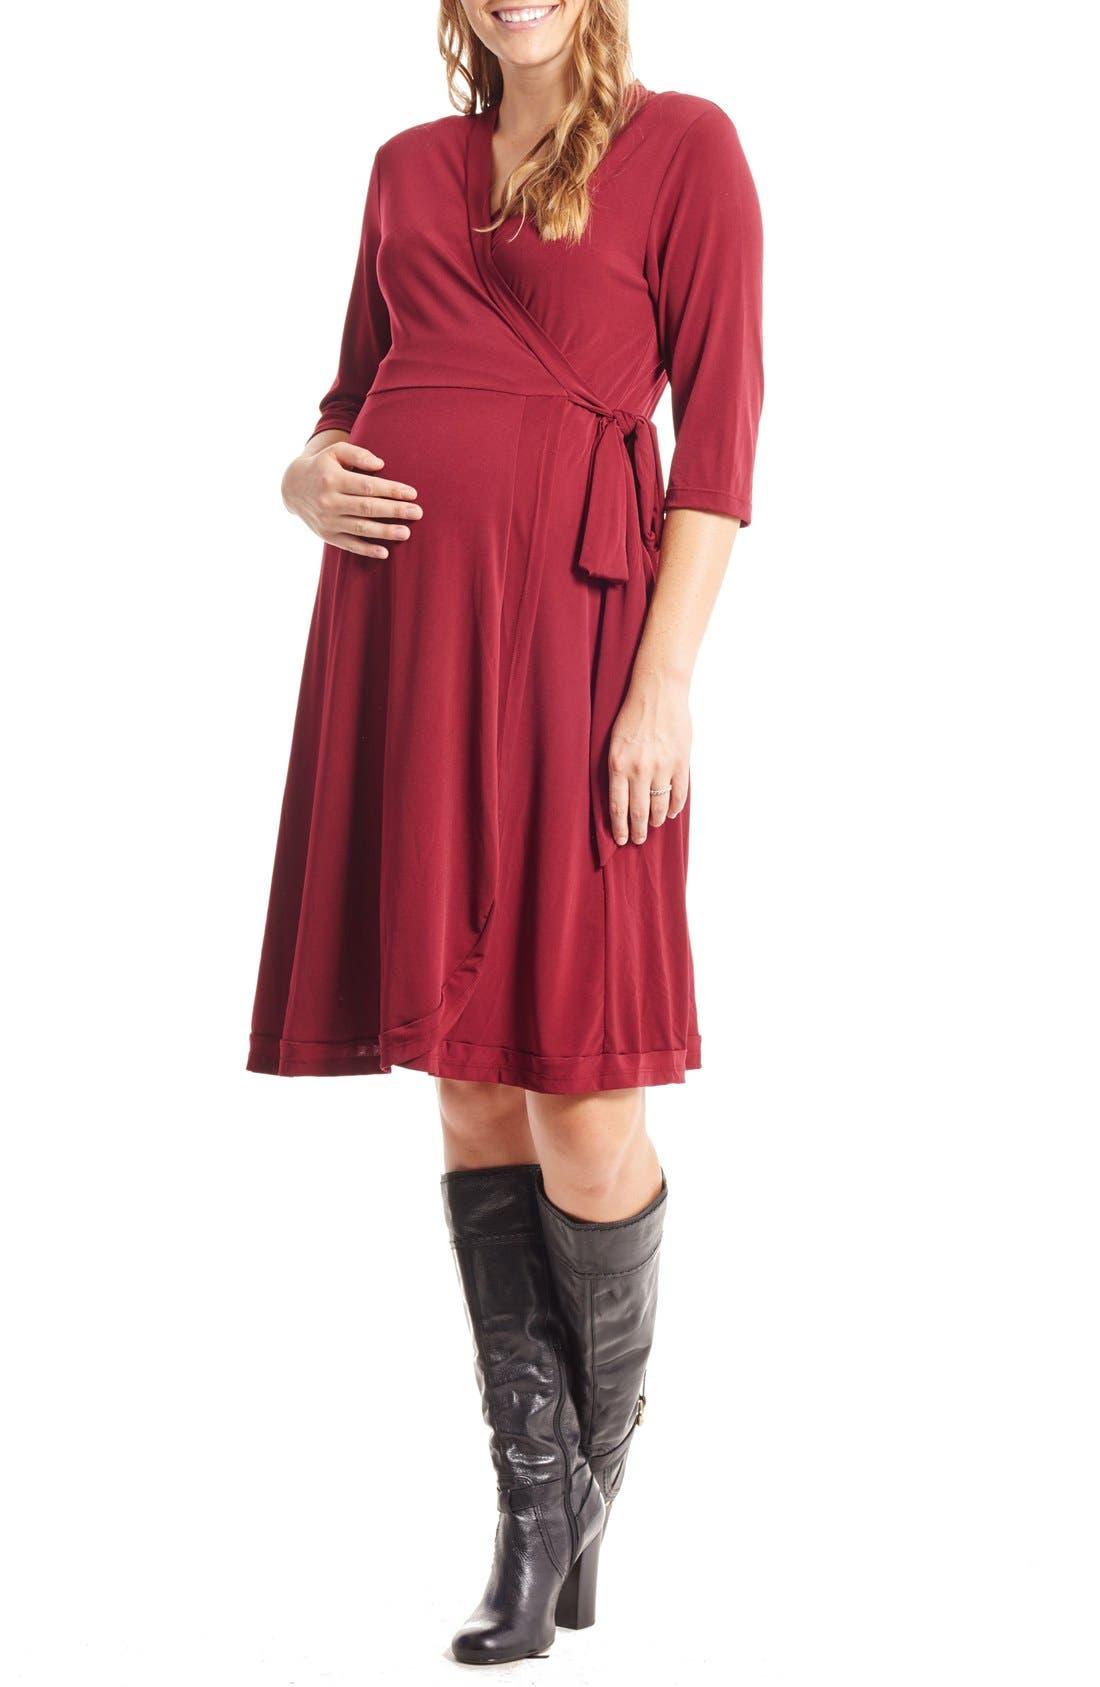 Alternate Image 1 Selected - Everly Grey Mila Wrap Maternity/Nursing Dress